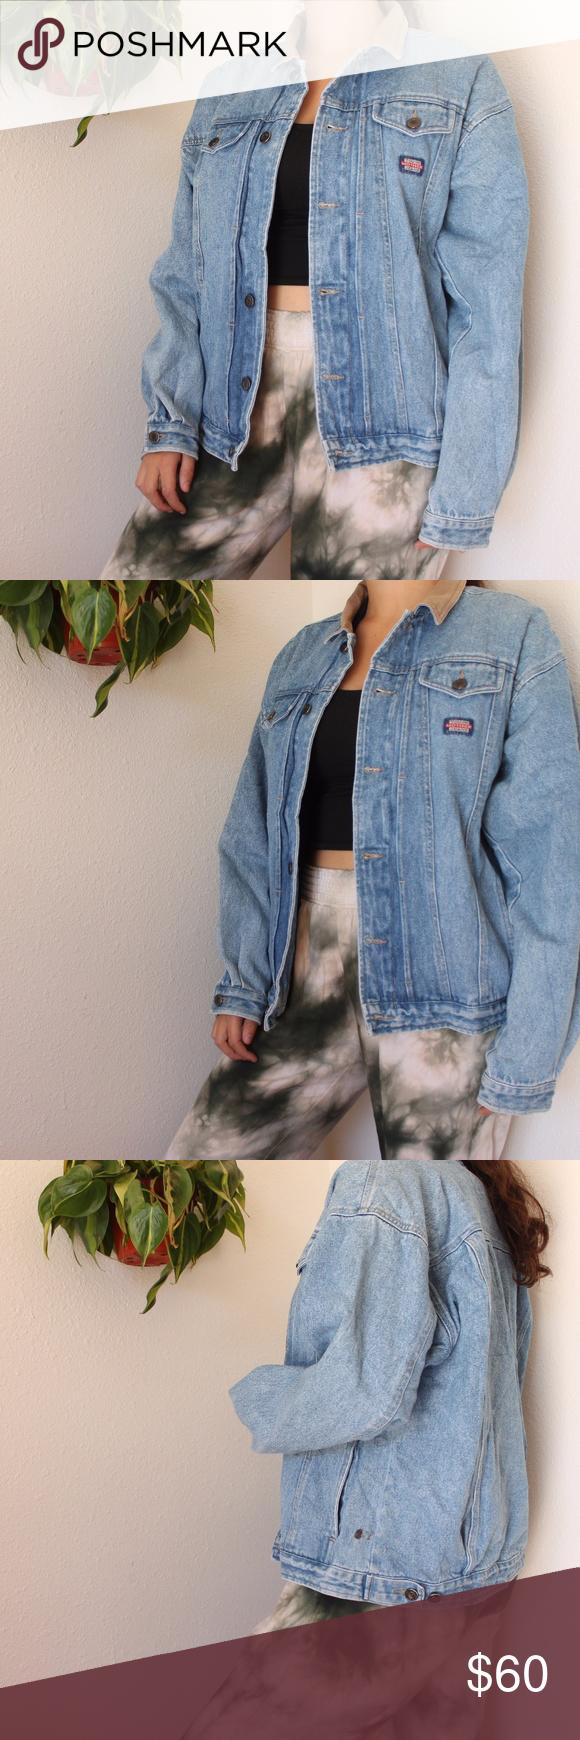 Vintage columbia denim jacket fleece vest columbia sportswear and